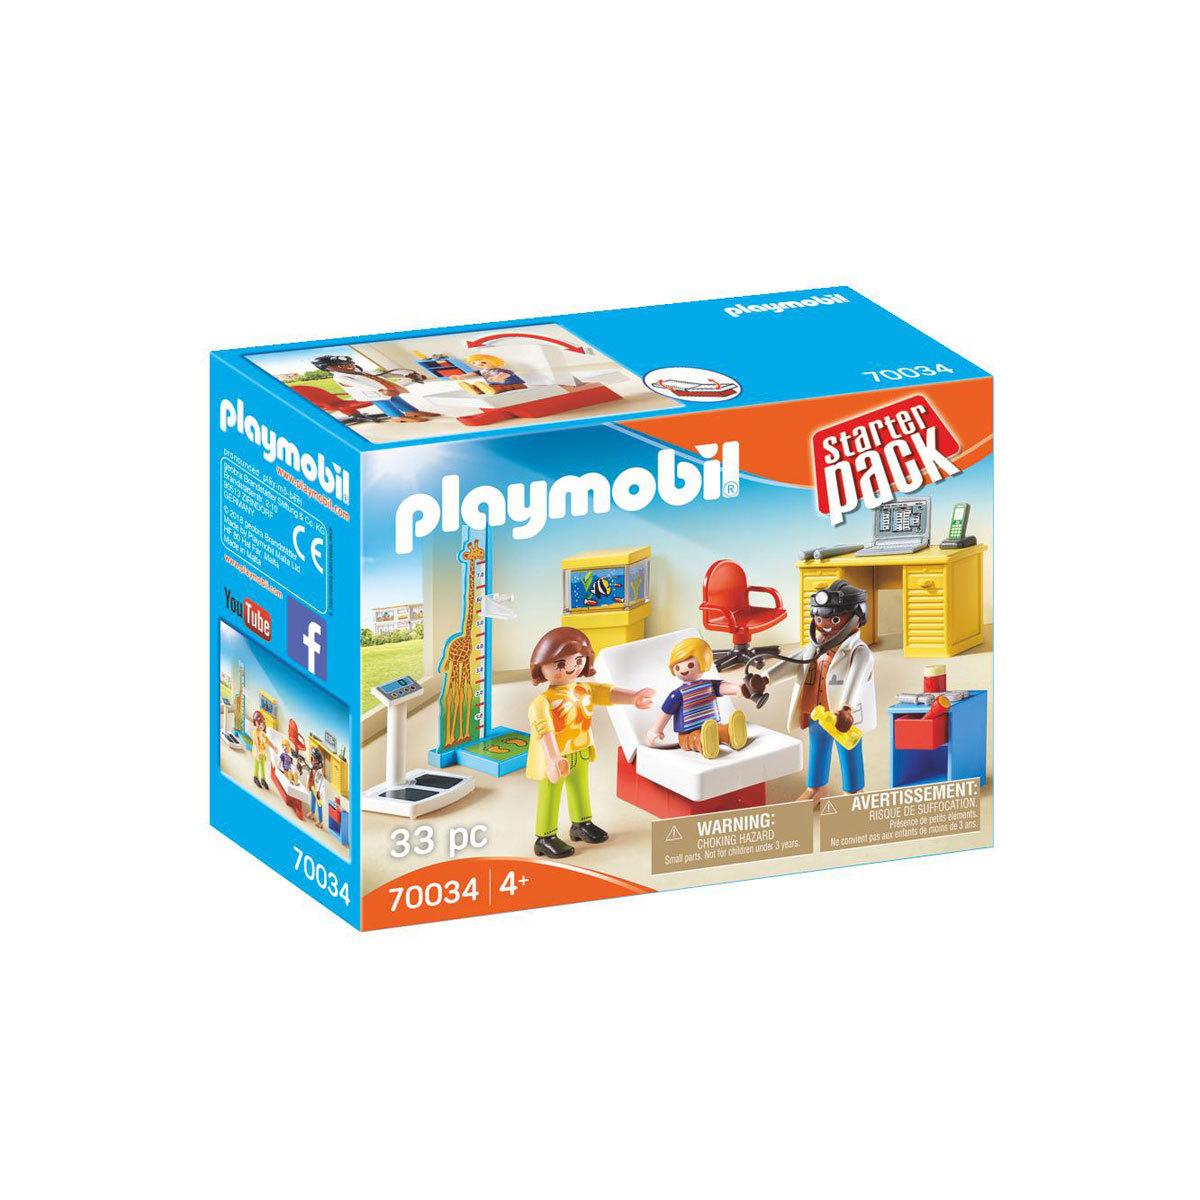 Playmobil 70034 City Life Children's Doctor Starter Pack from Early Learning Center